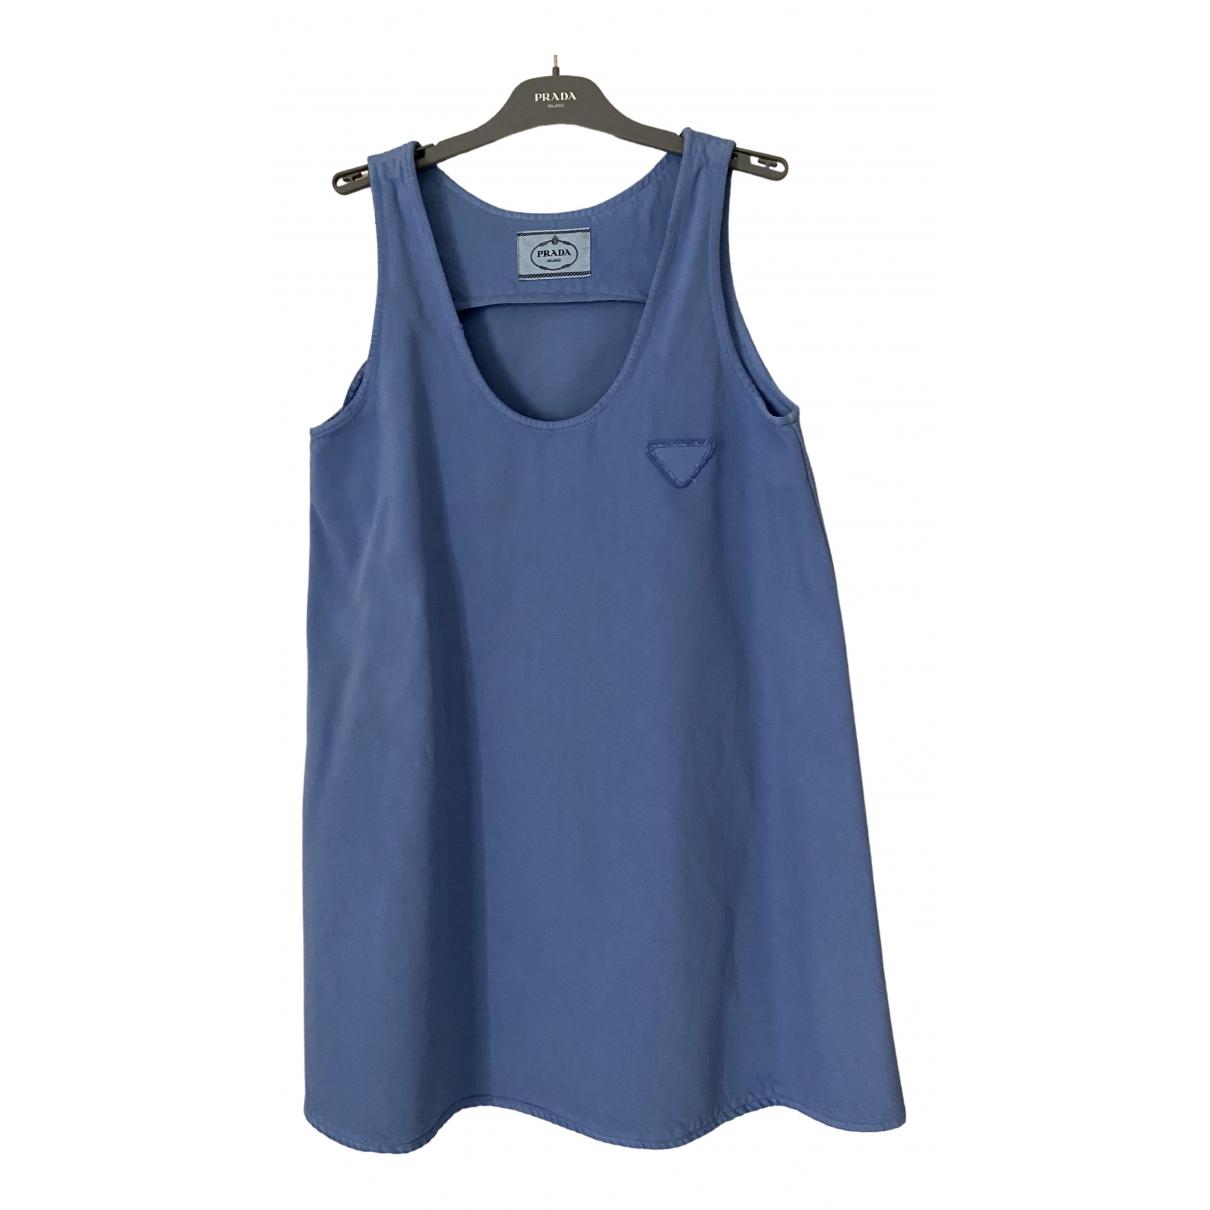 Prada \N Blue Cotton dress for Women 42 IT